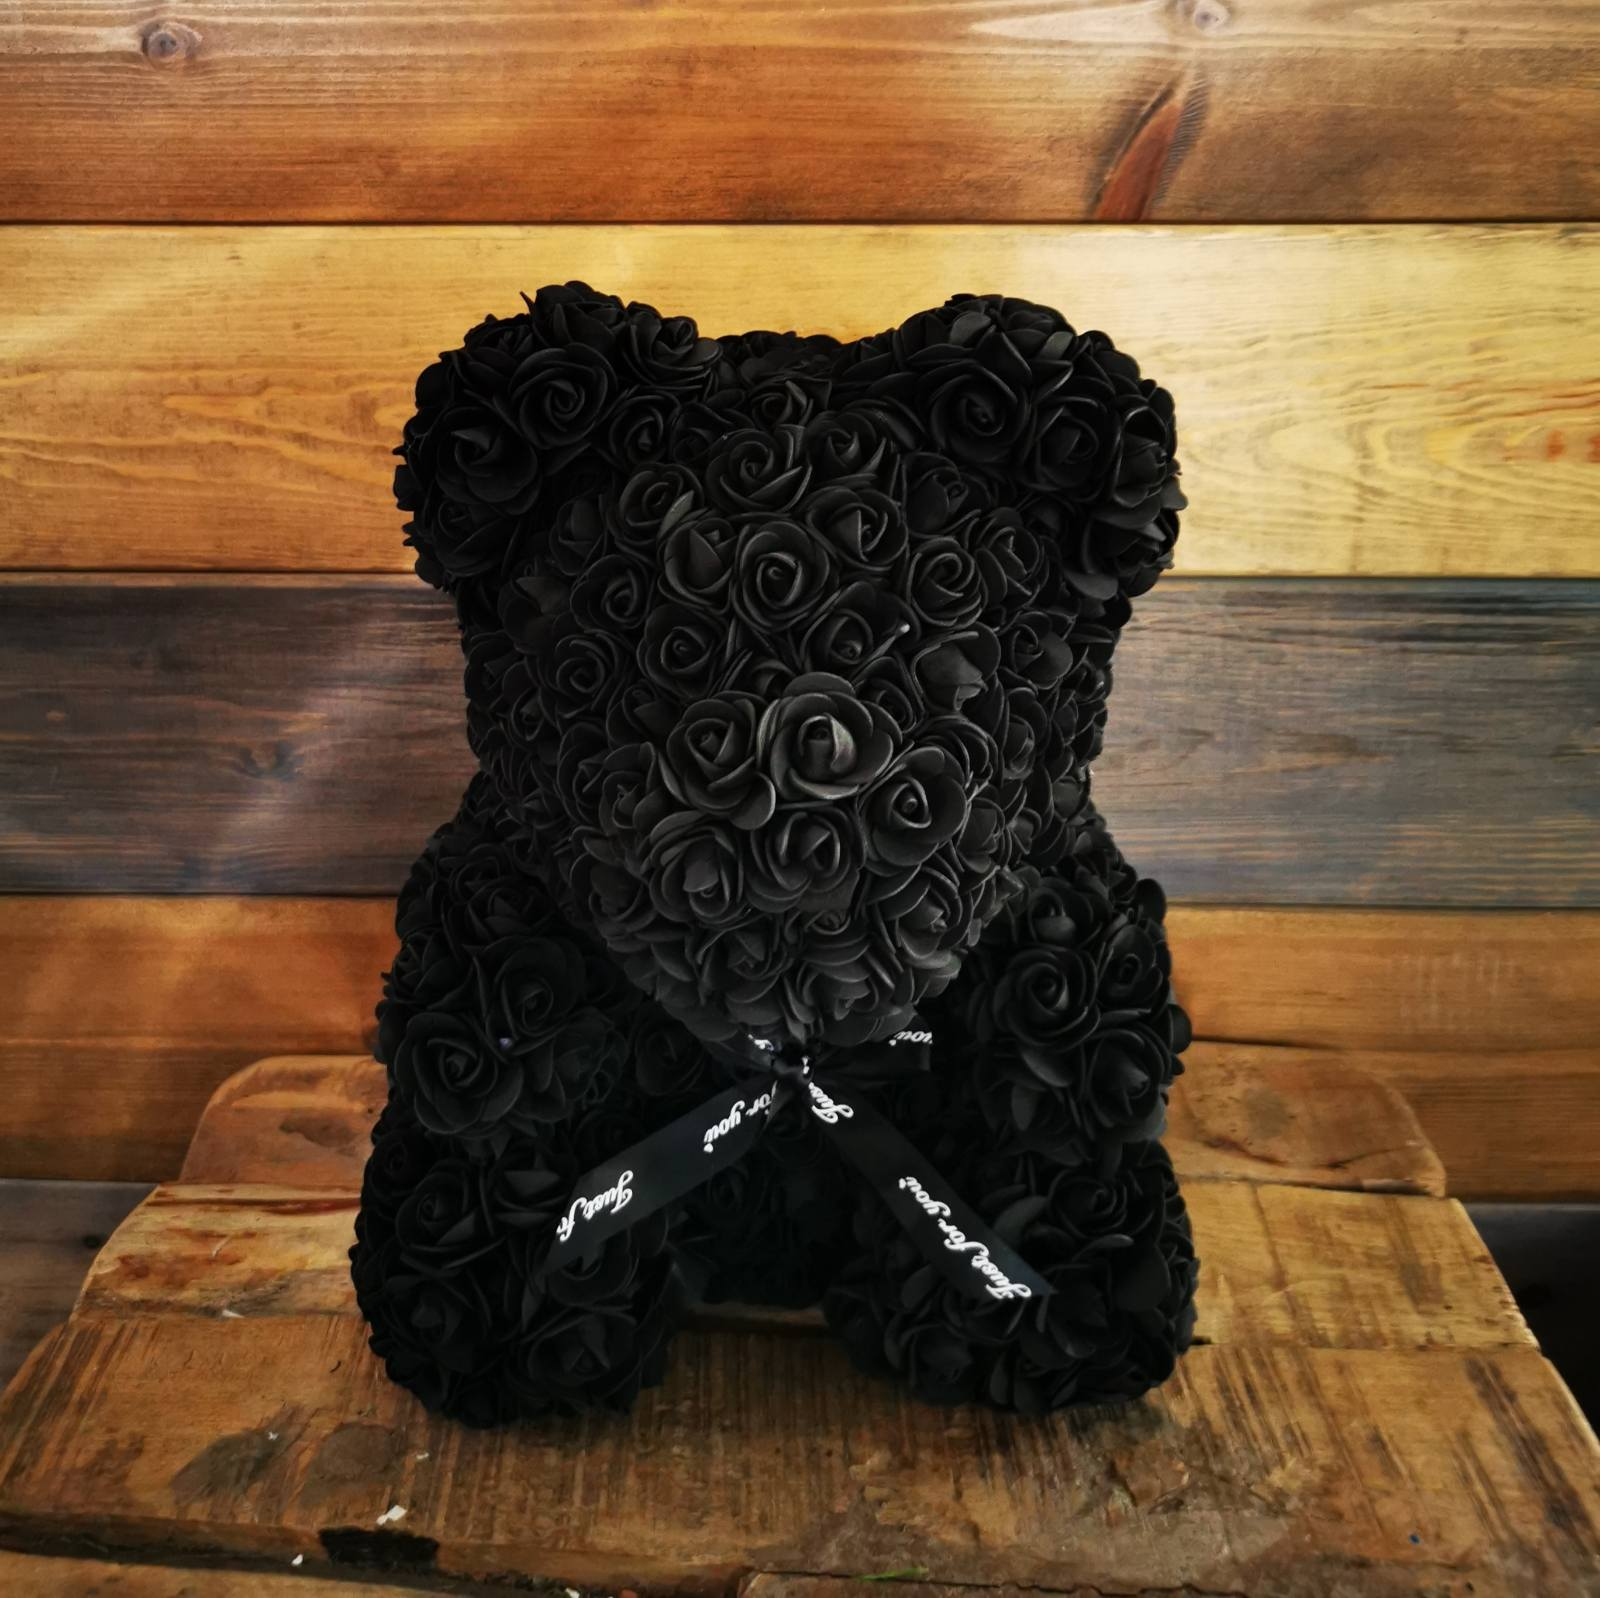 ARTIFICIAL BLACK TEDDY BEAR SMALL SIZE